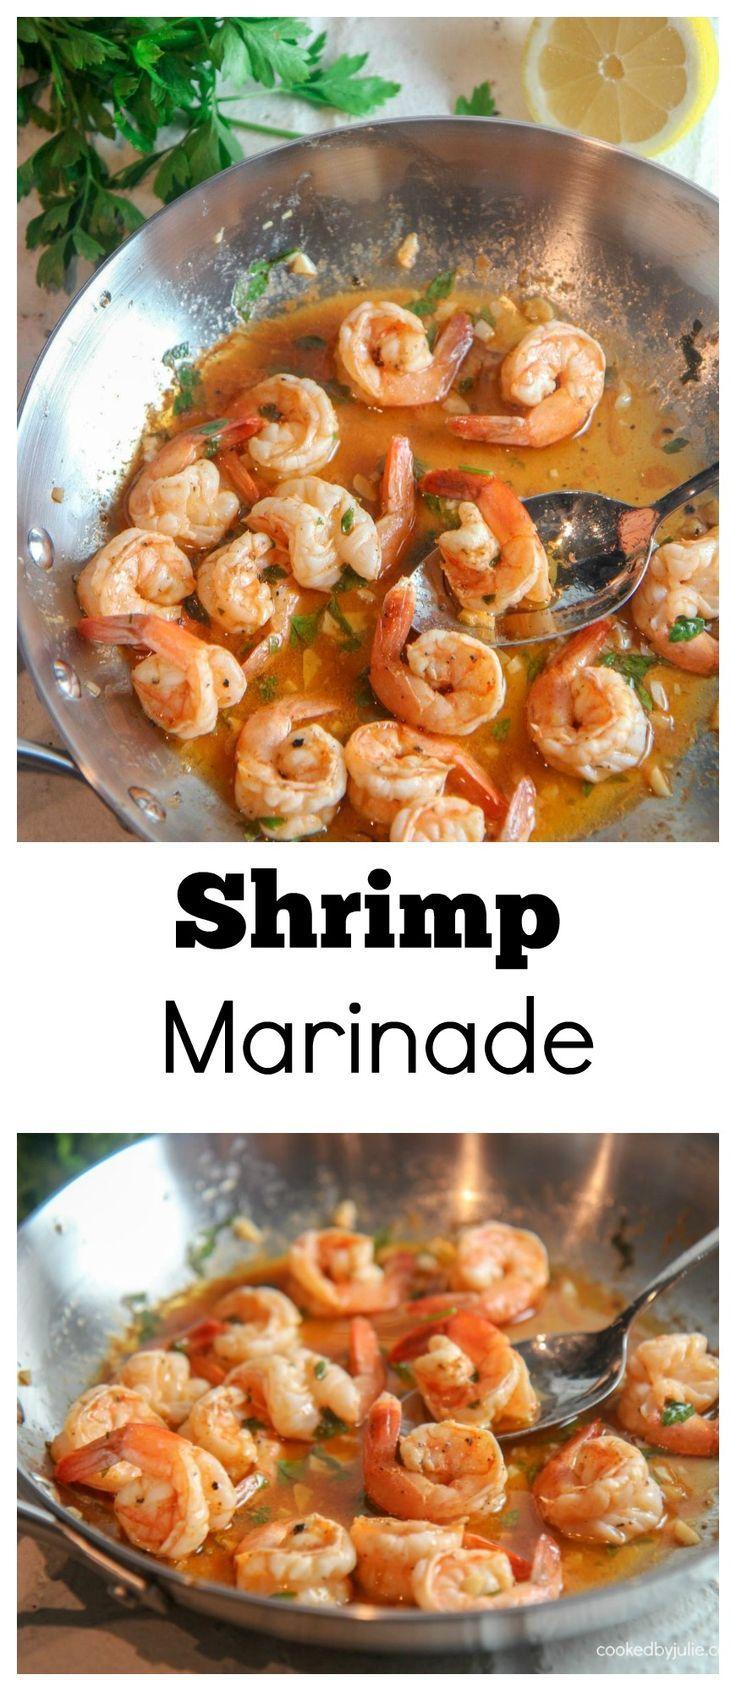 Low Carb Shrimp Marinade